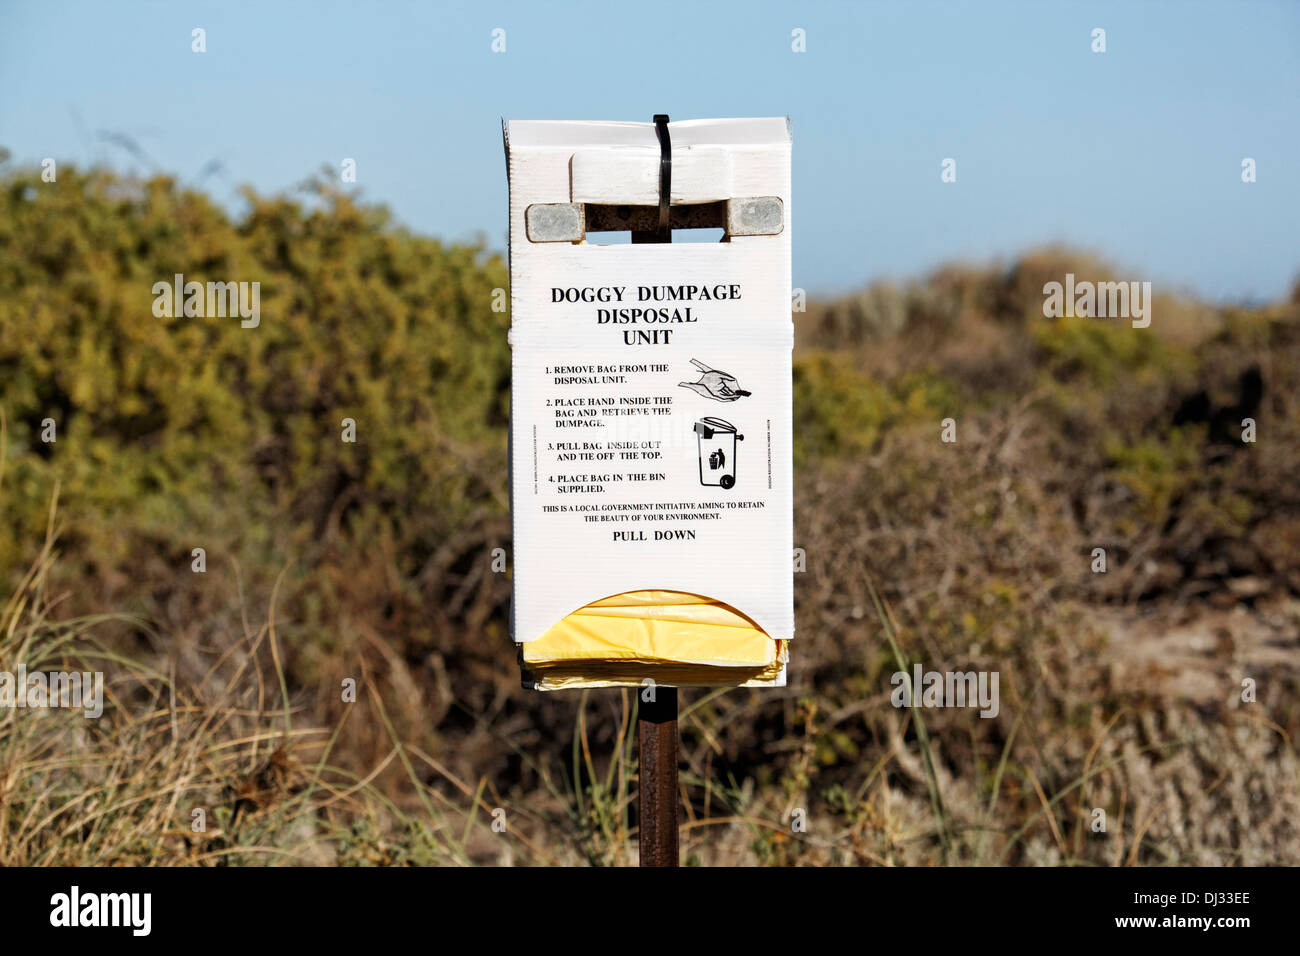 Doggy dump disposal unit, Dongara Western Australia - Stock Image